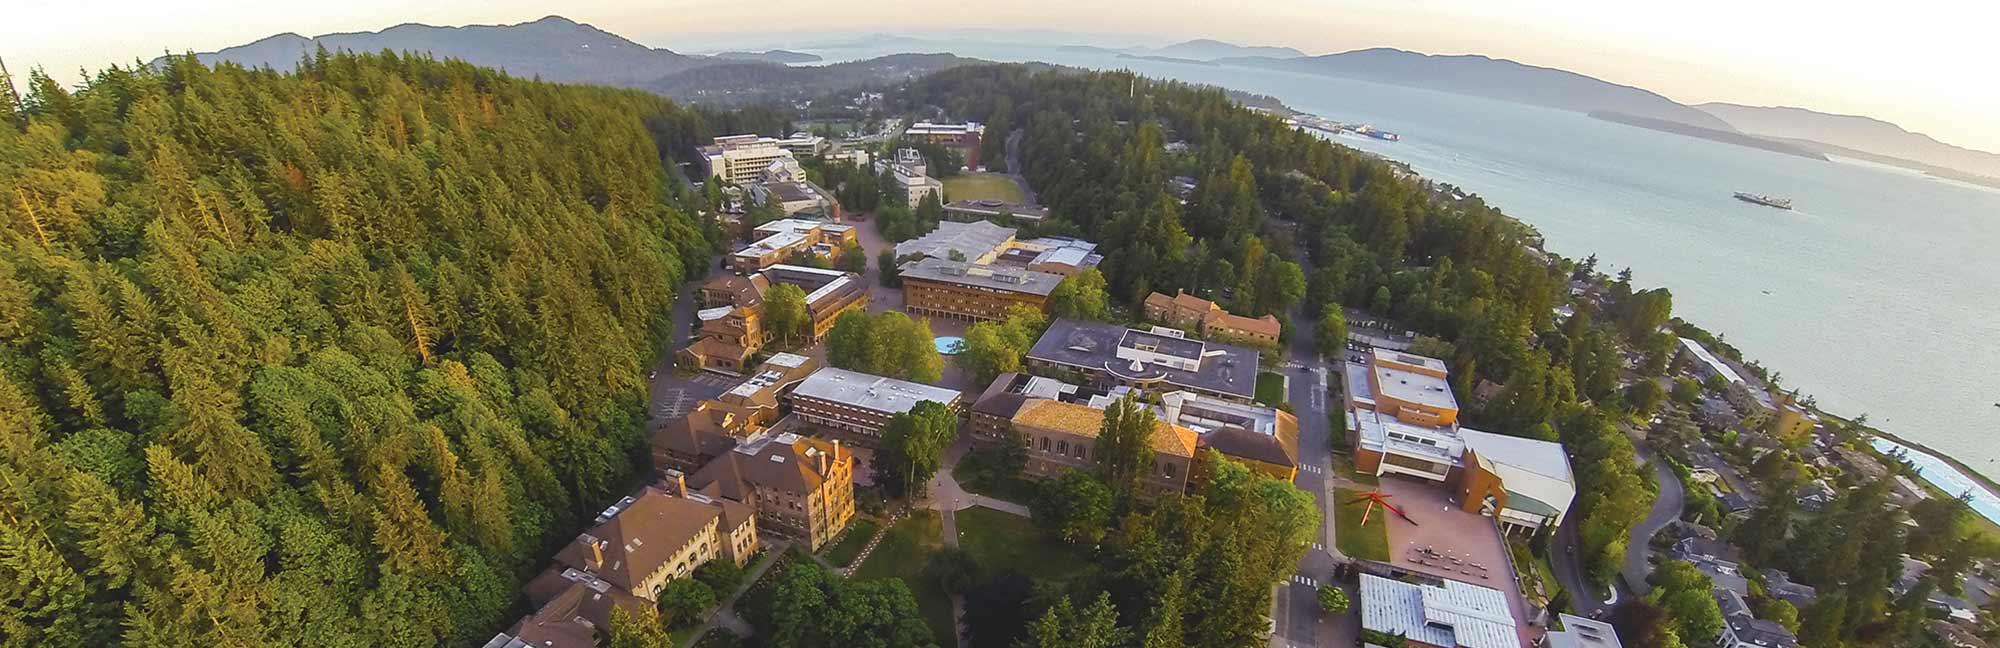 Western Washington University - Niche